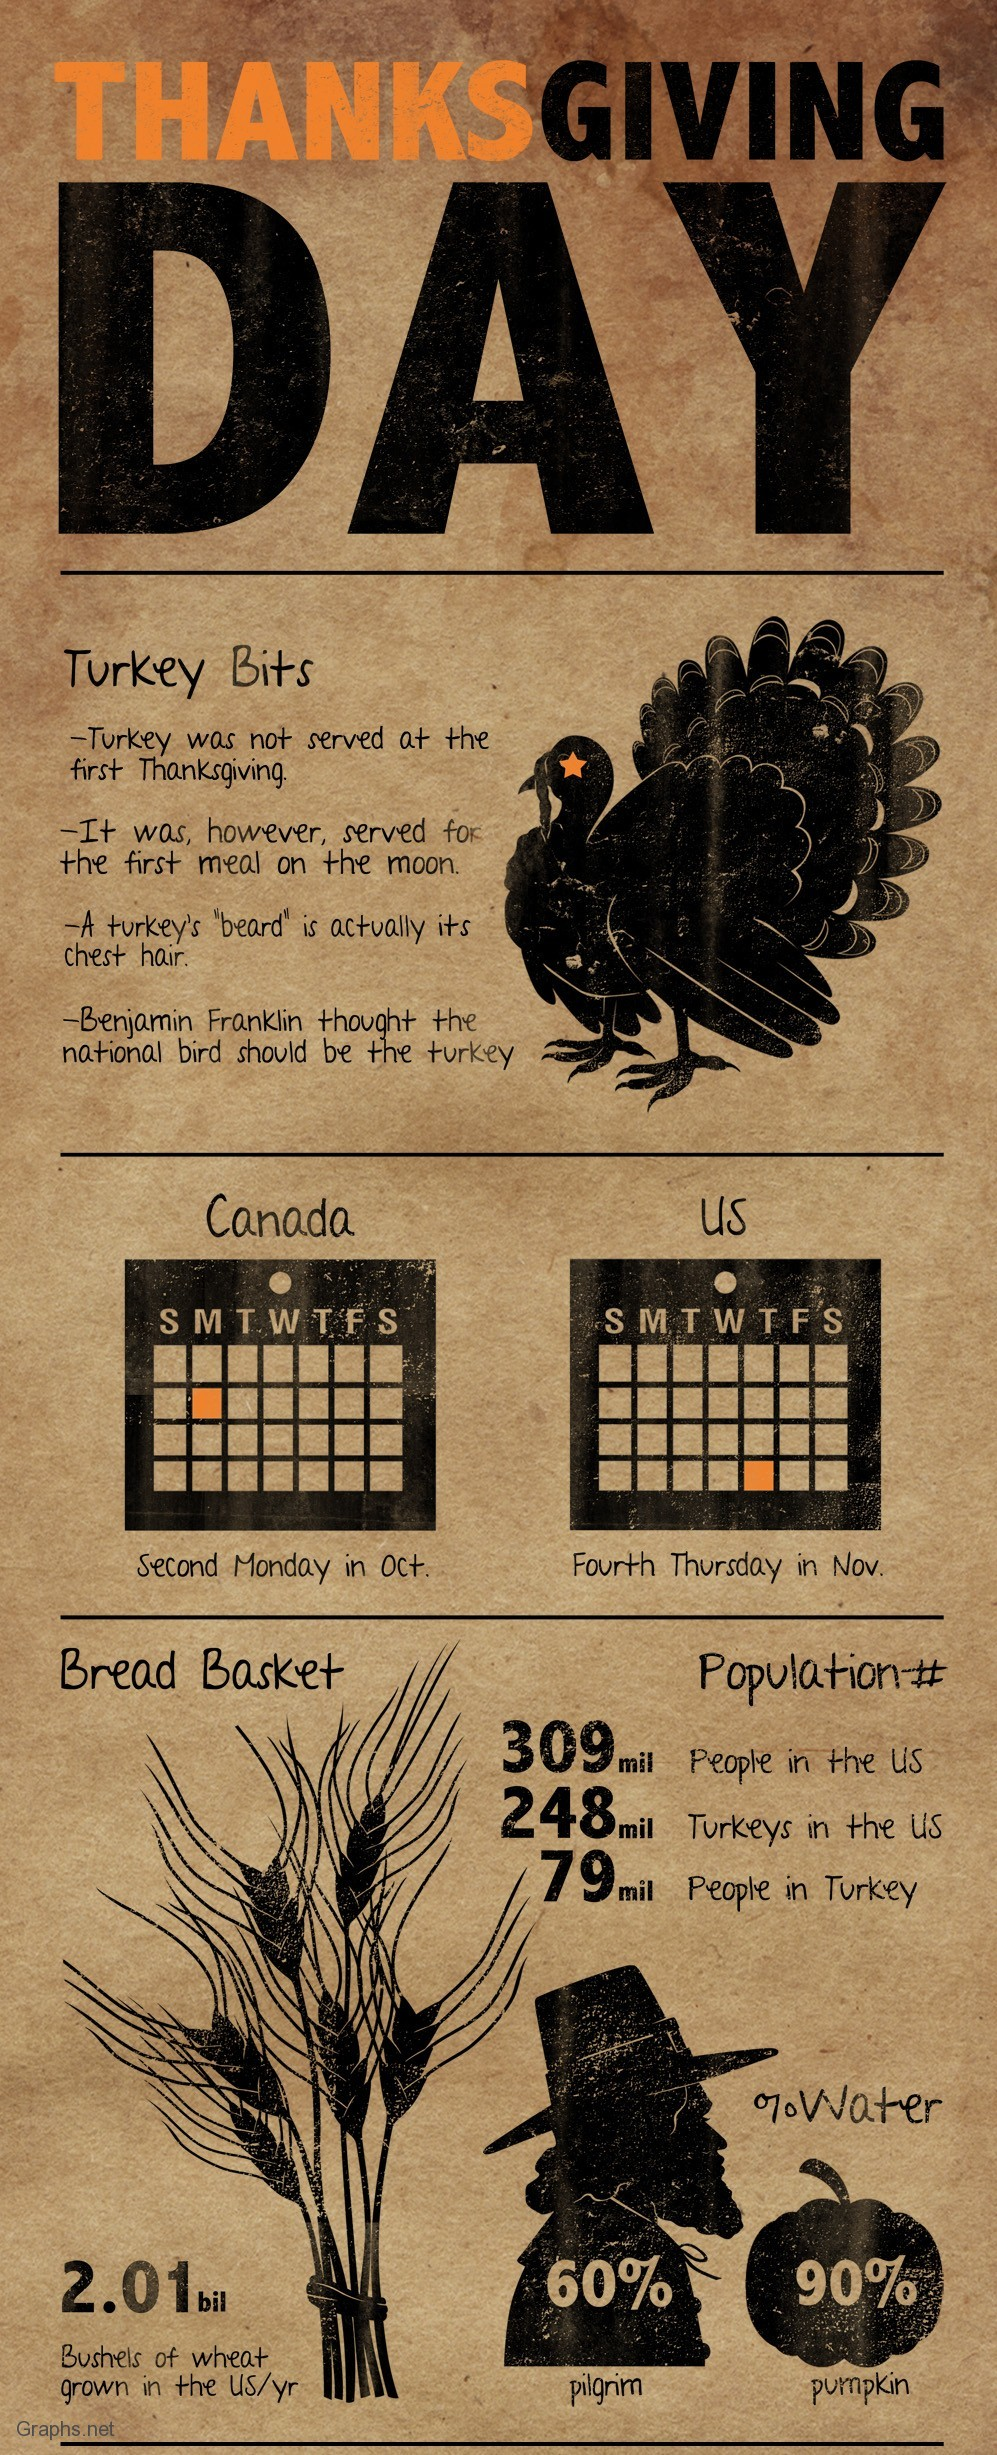 Turkey Bits on Thanksgiving Day